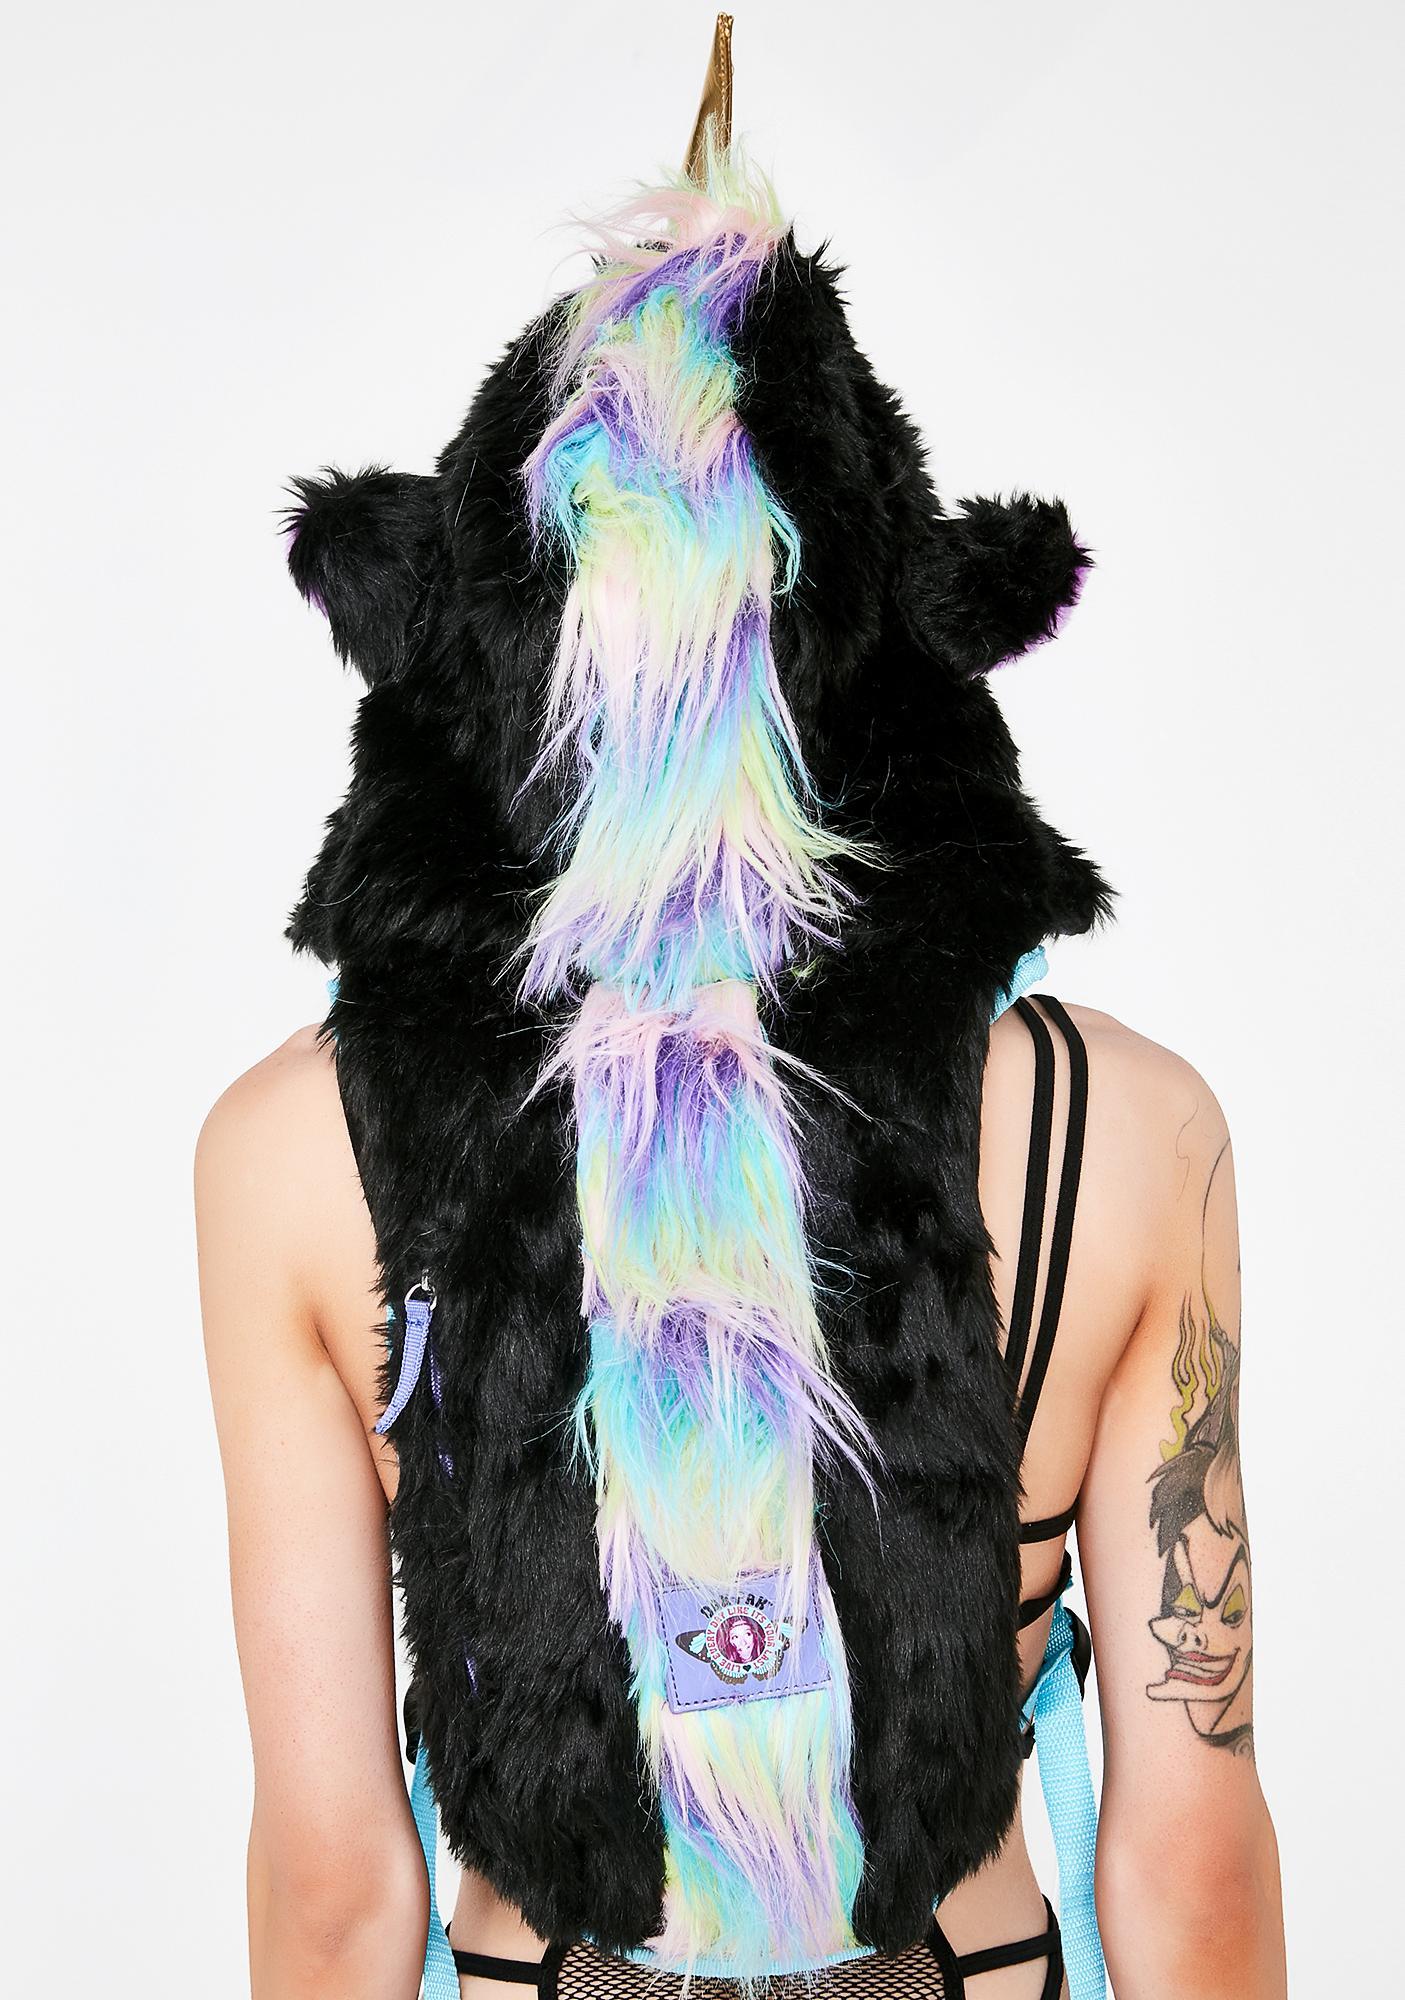 Dan-Pak Dark Mystical Unicorn Hydration Backpack